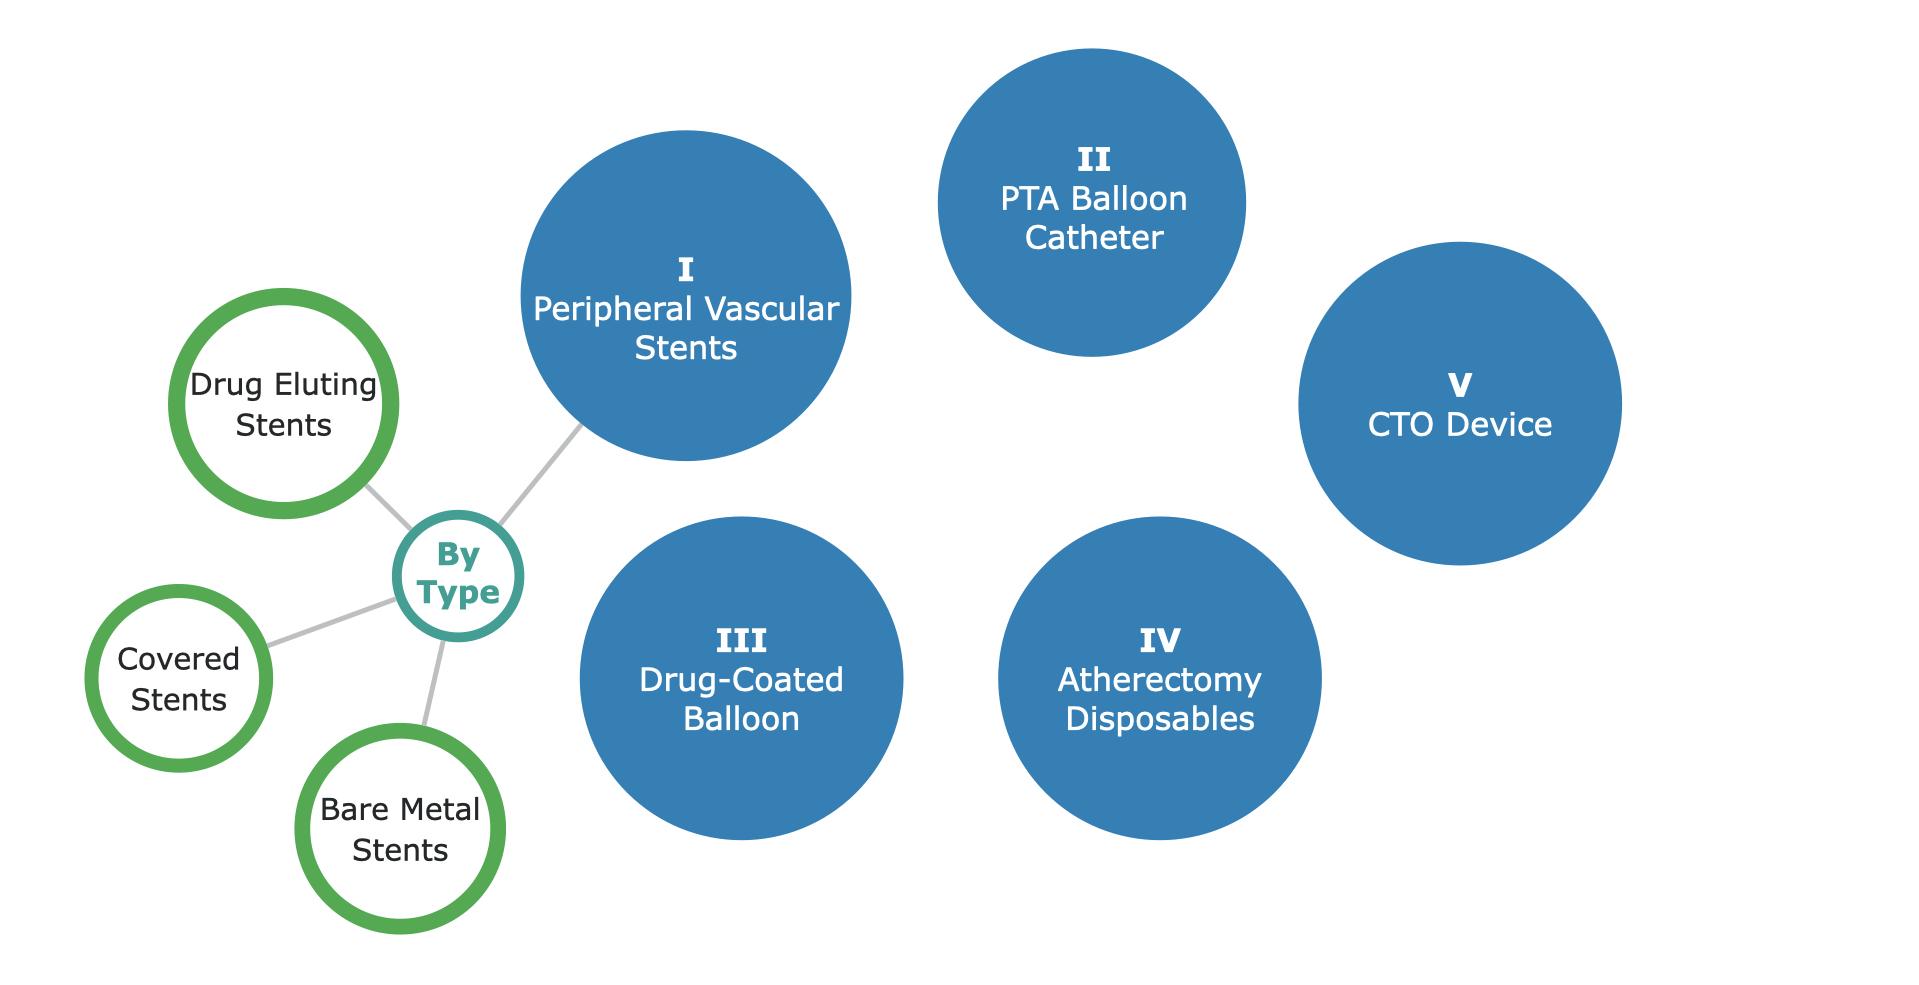 Global Peripheral Vascular Market Segmentation - 1